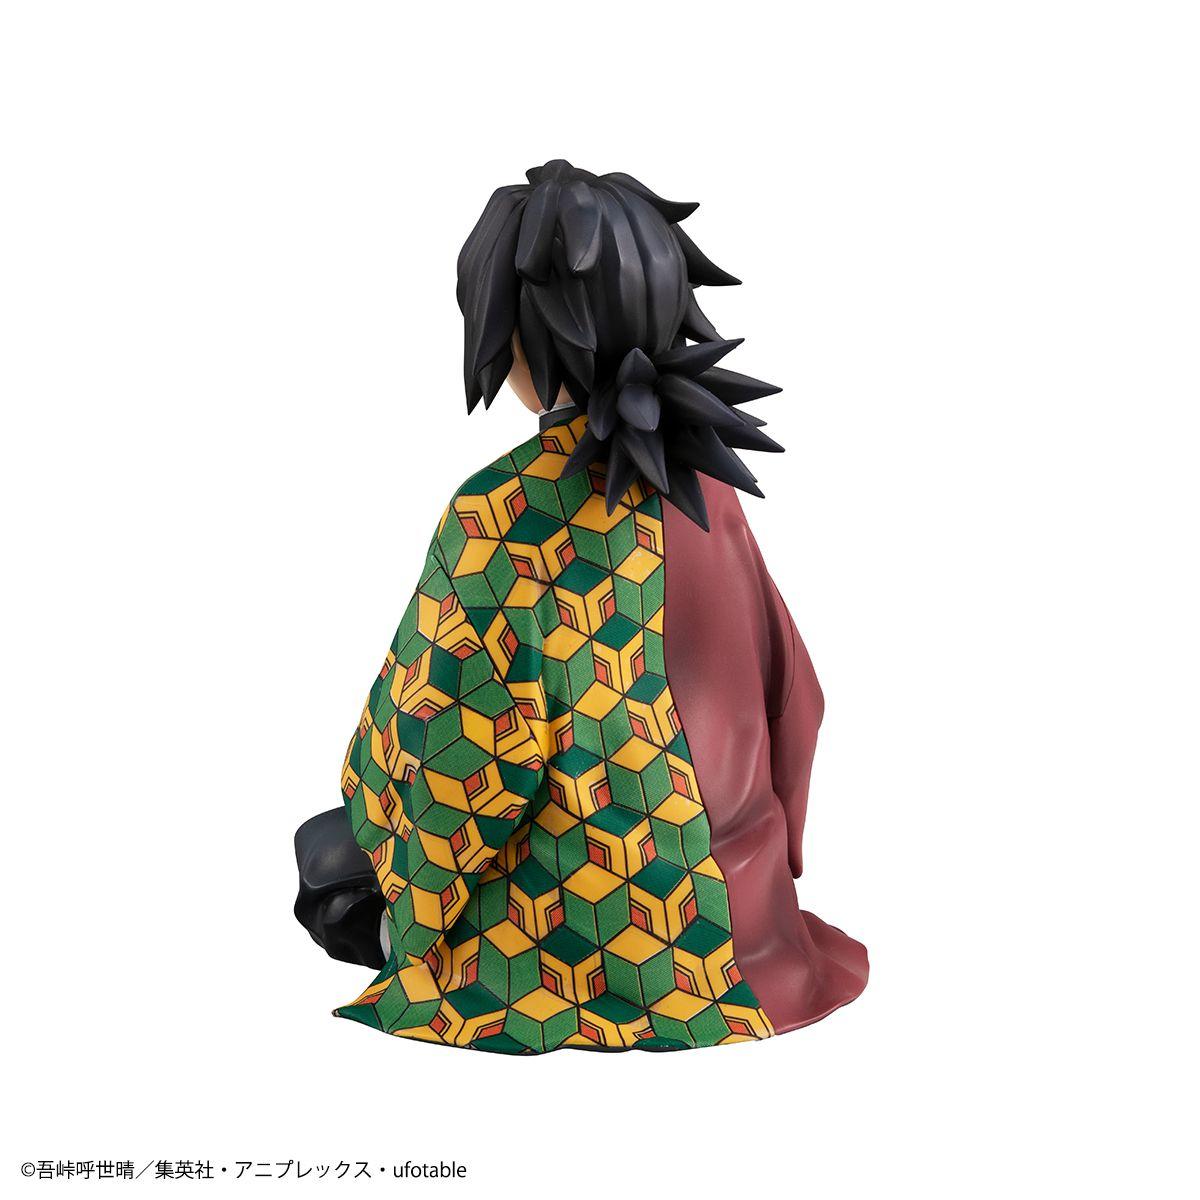 Tomioka_4 - Figura semanal (1-7-03-2021) - Hanami Dango